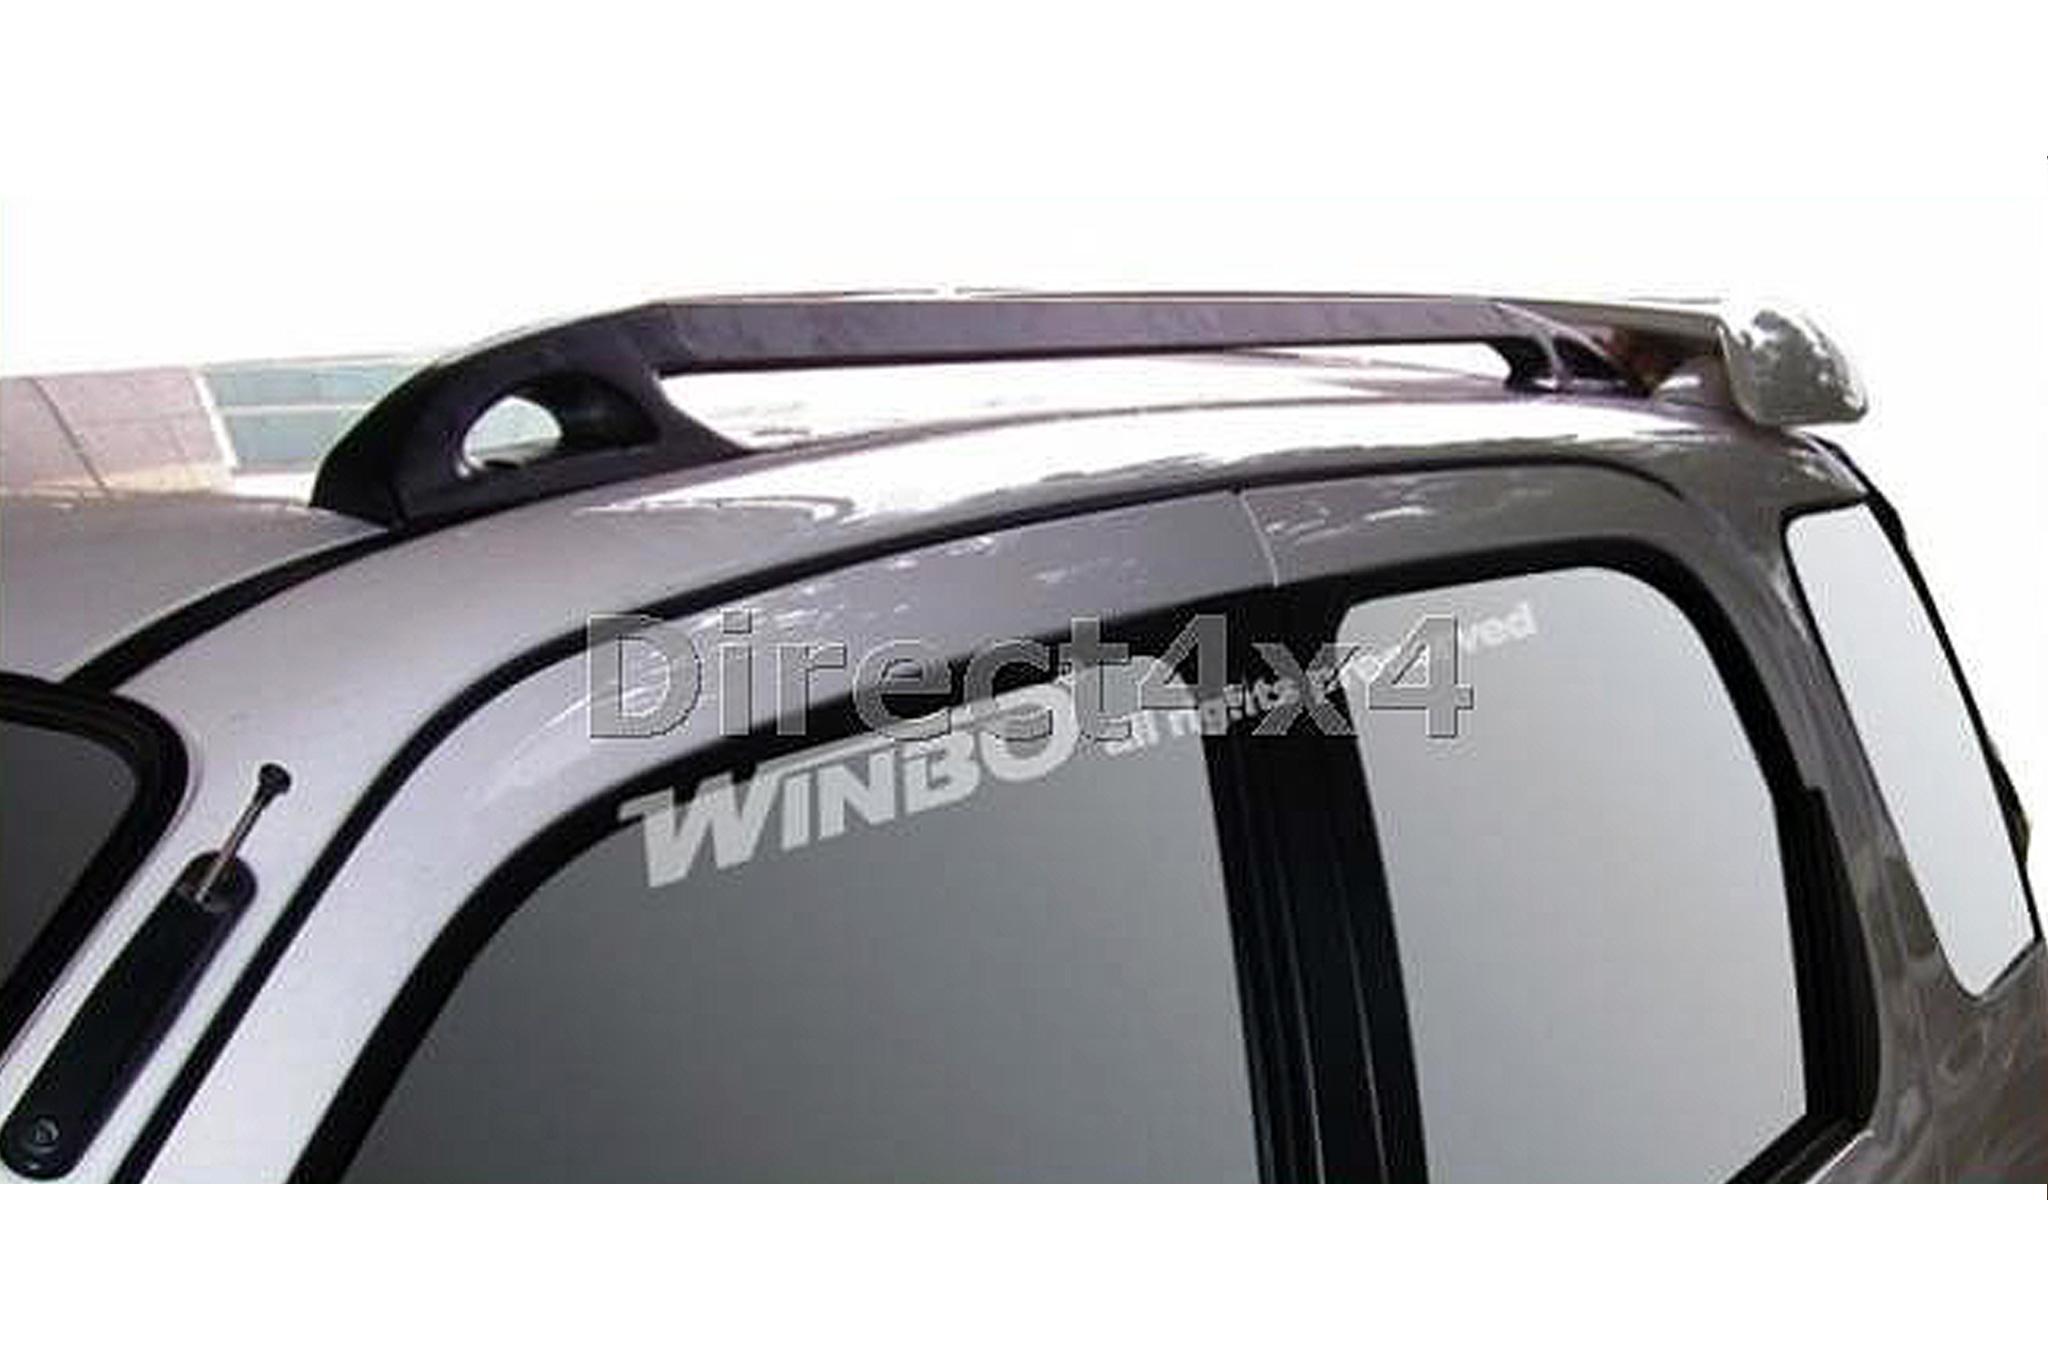 Exceptional Daihatsu Terios 97 06 Roof Rack Ladder Bars And Rails Travel Aluminium Black